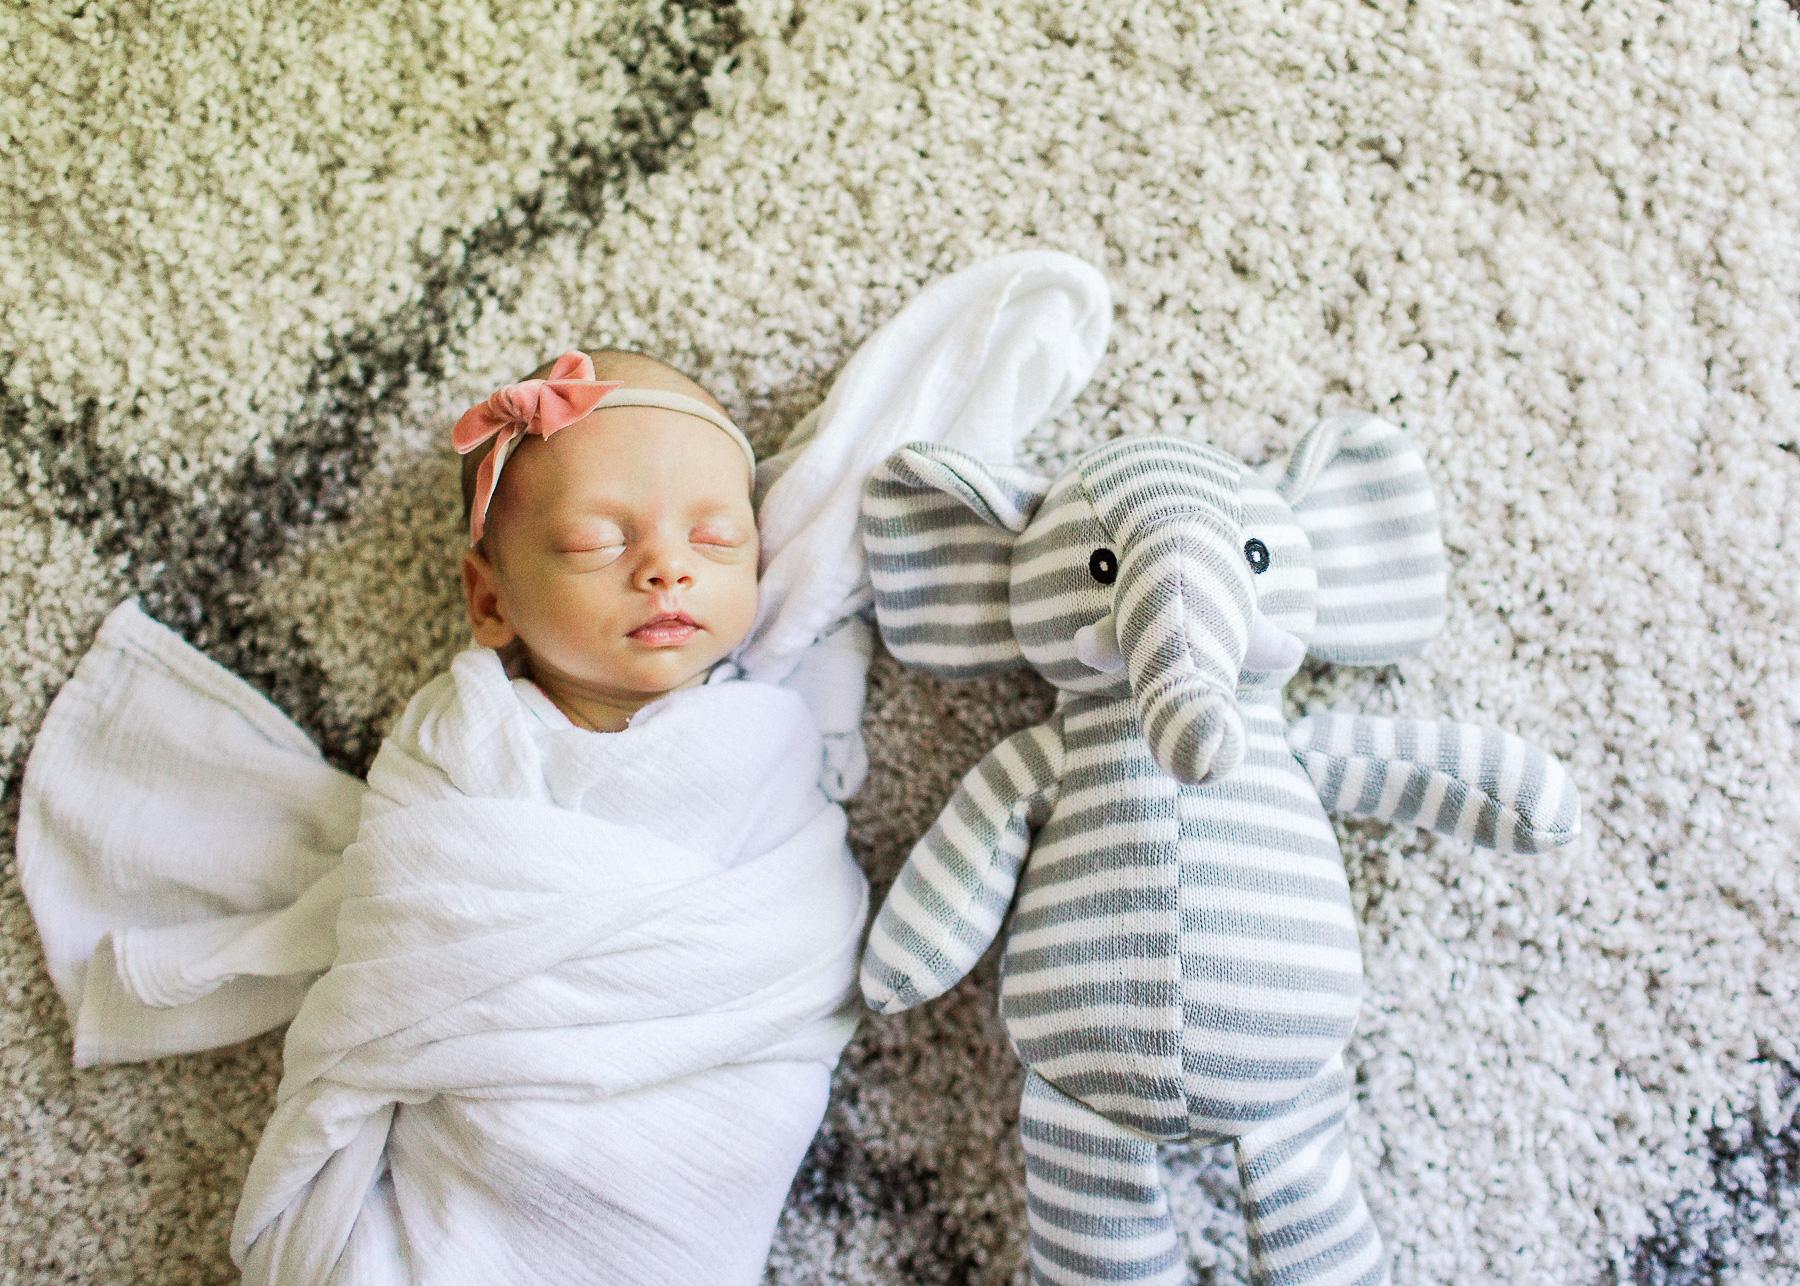 baby next to elephant stuffy